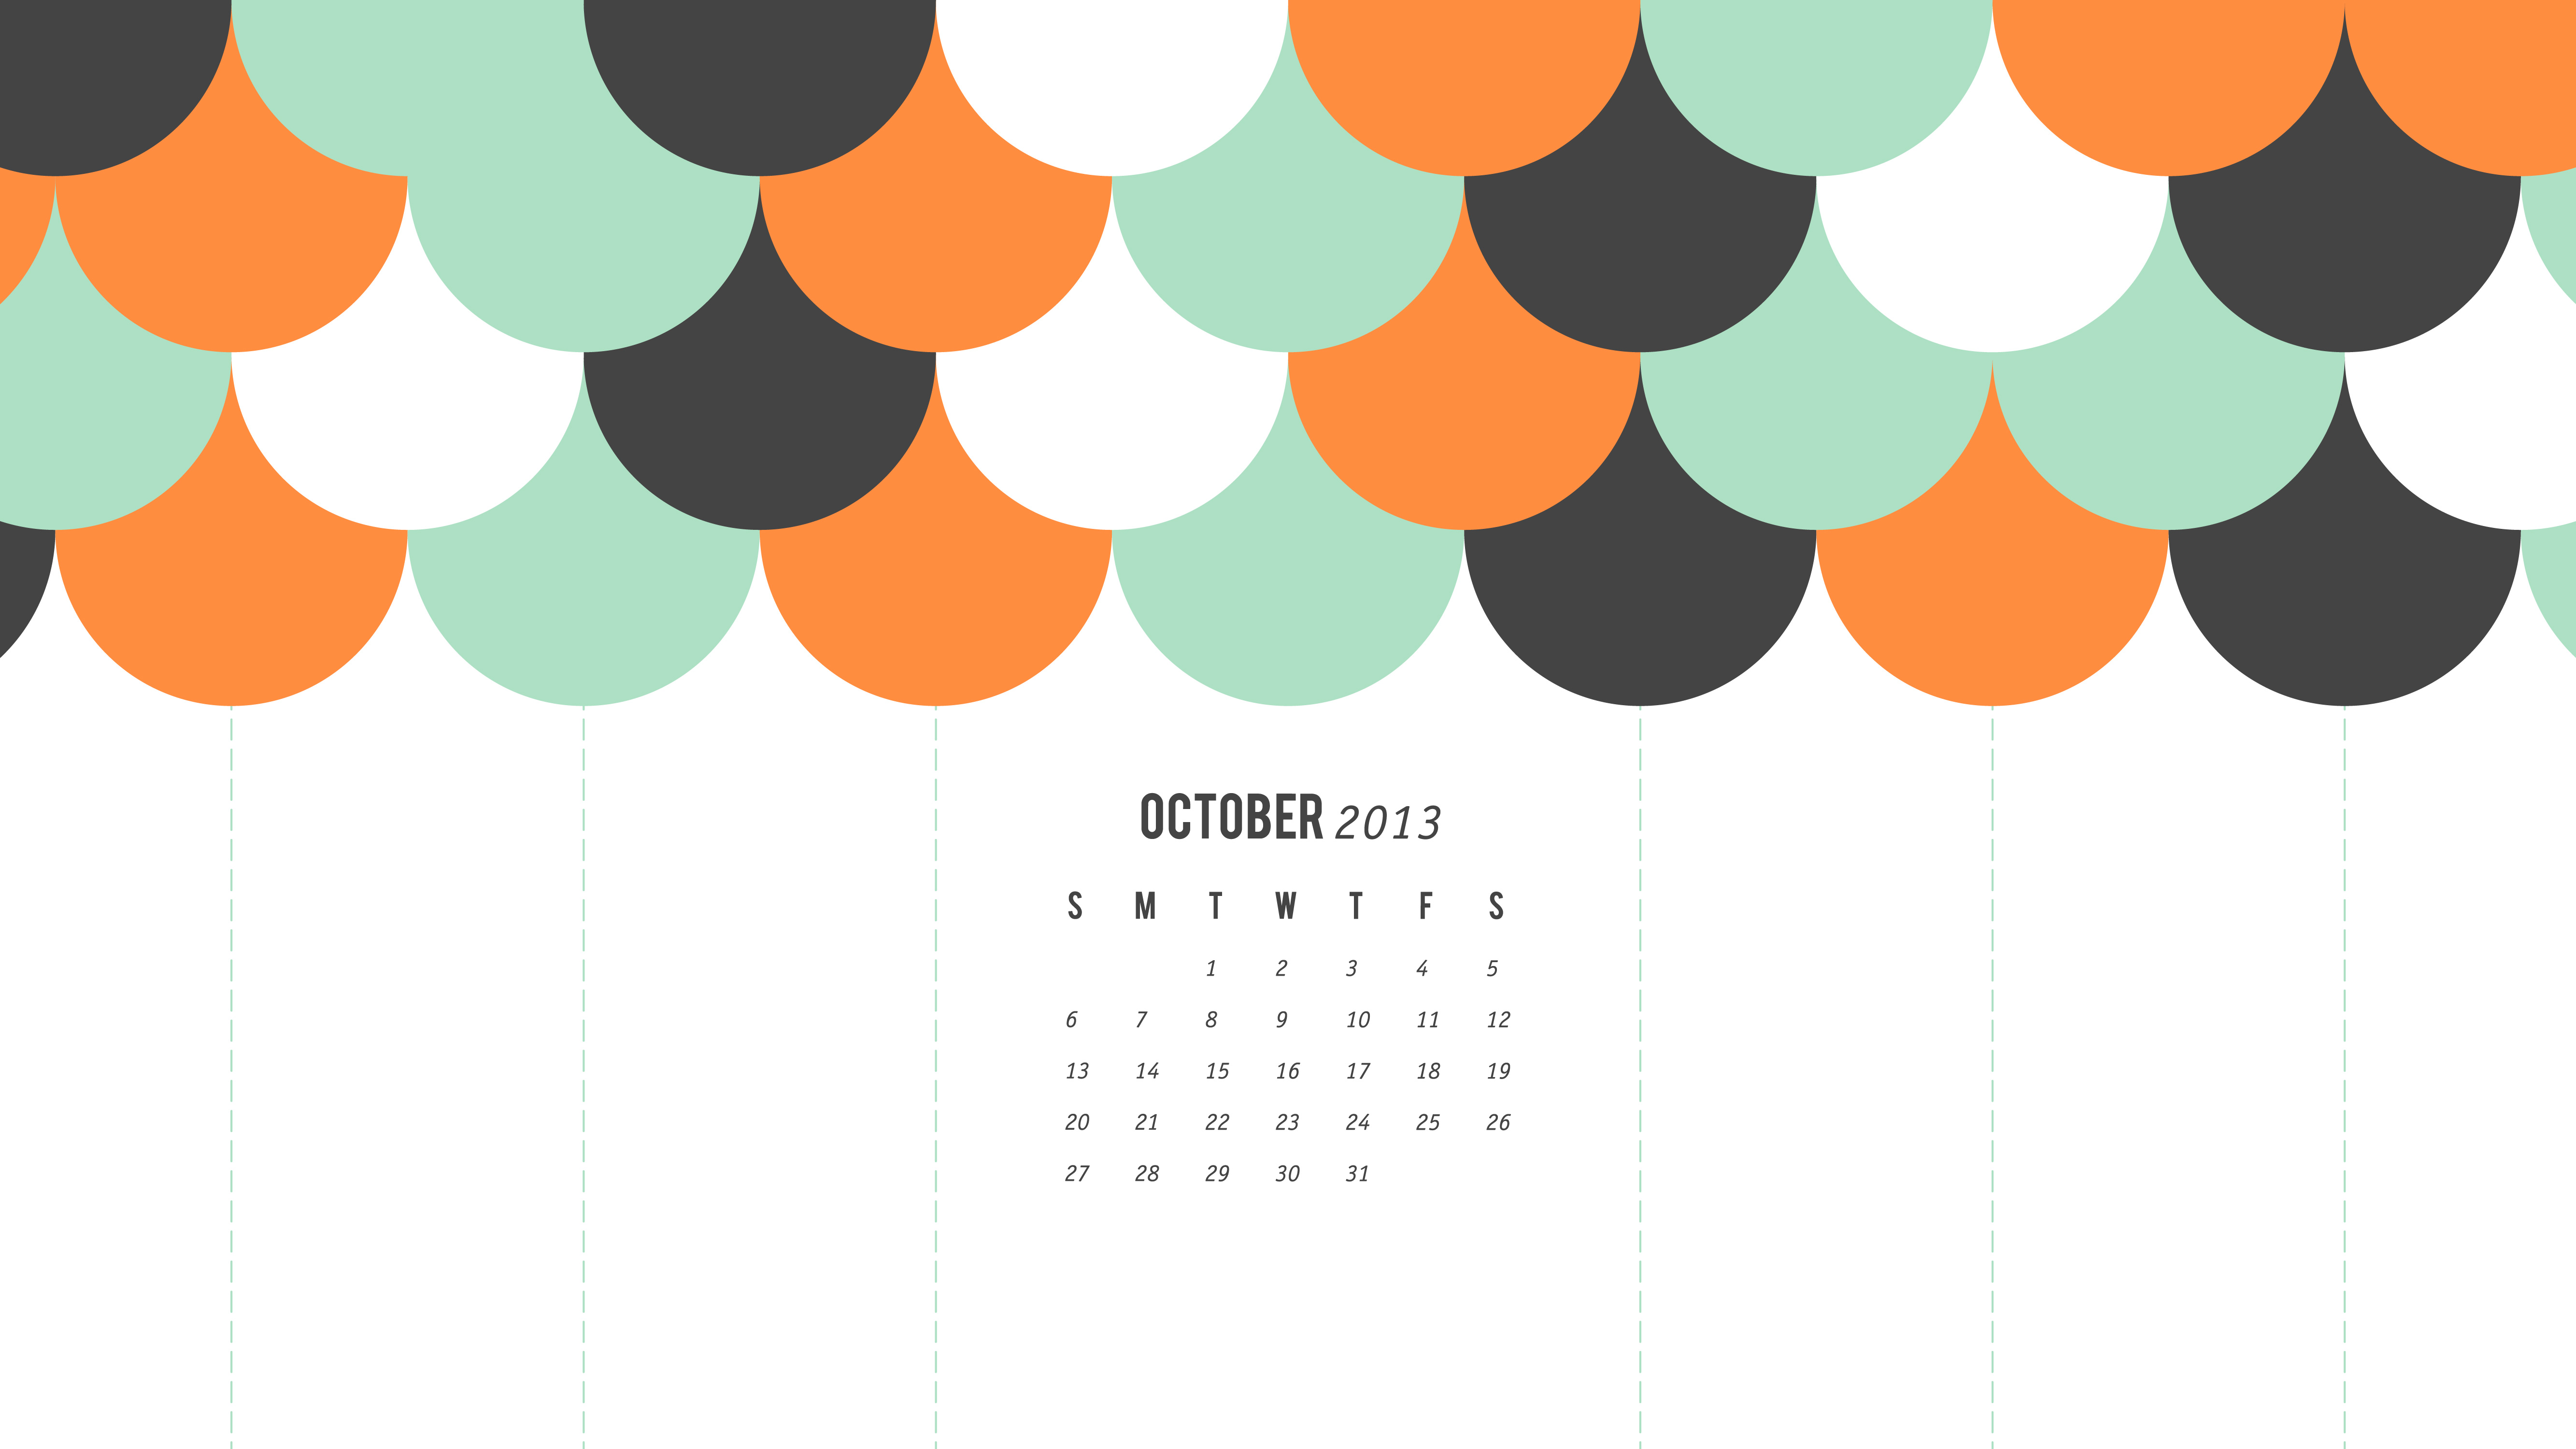 Calendar Background Design : Sarah hearts october calendar wallpaper